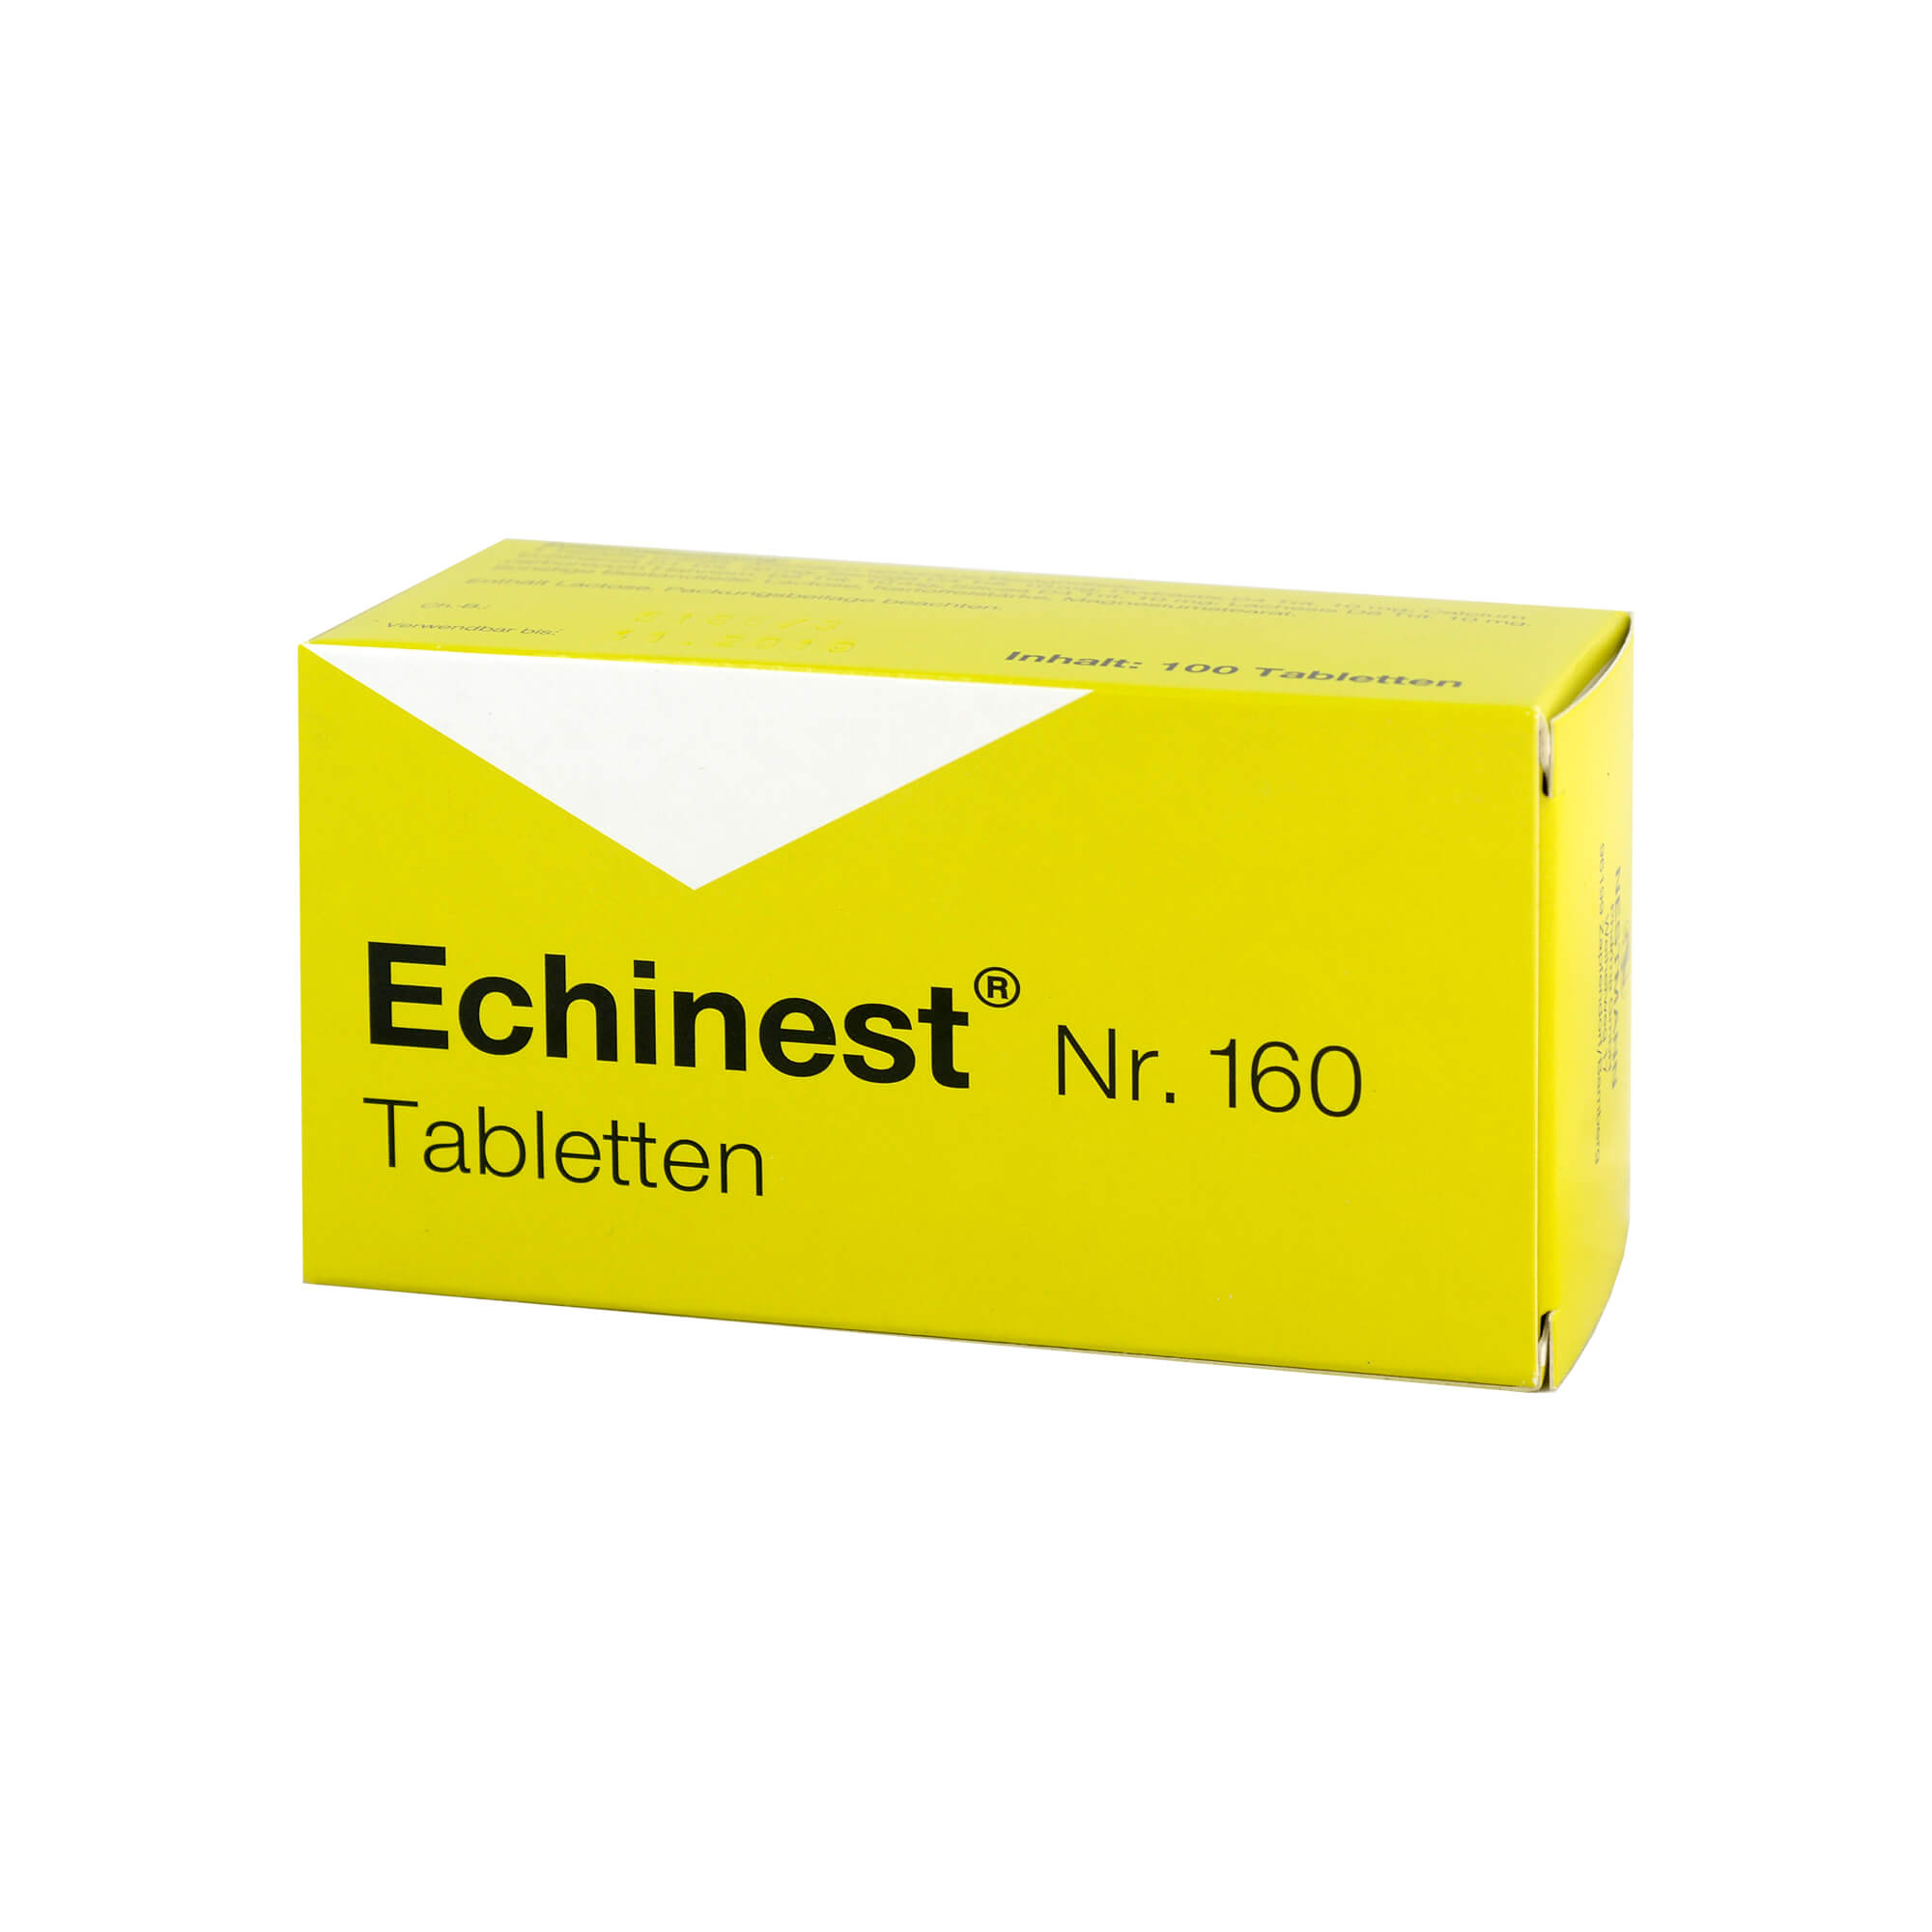 Echinest Nr. 160 Tabletten